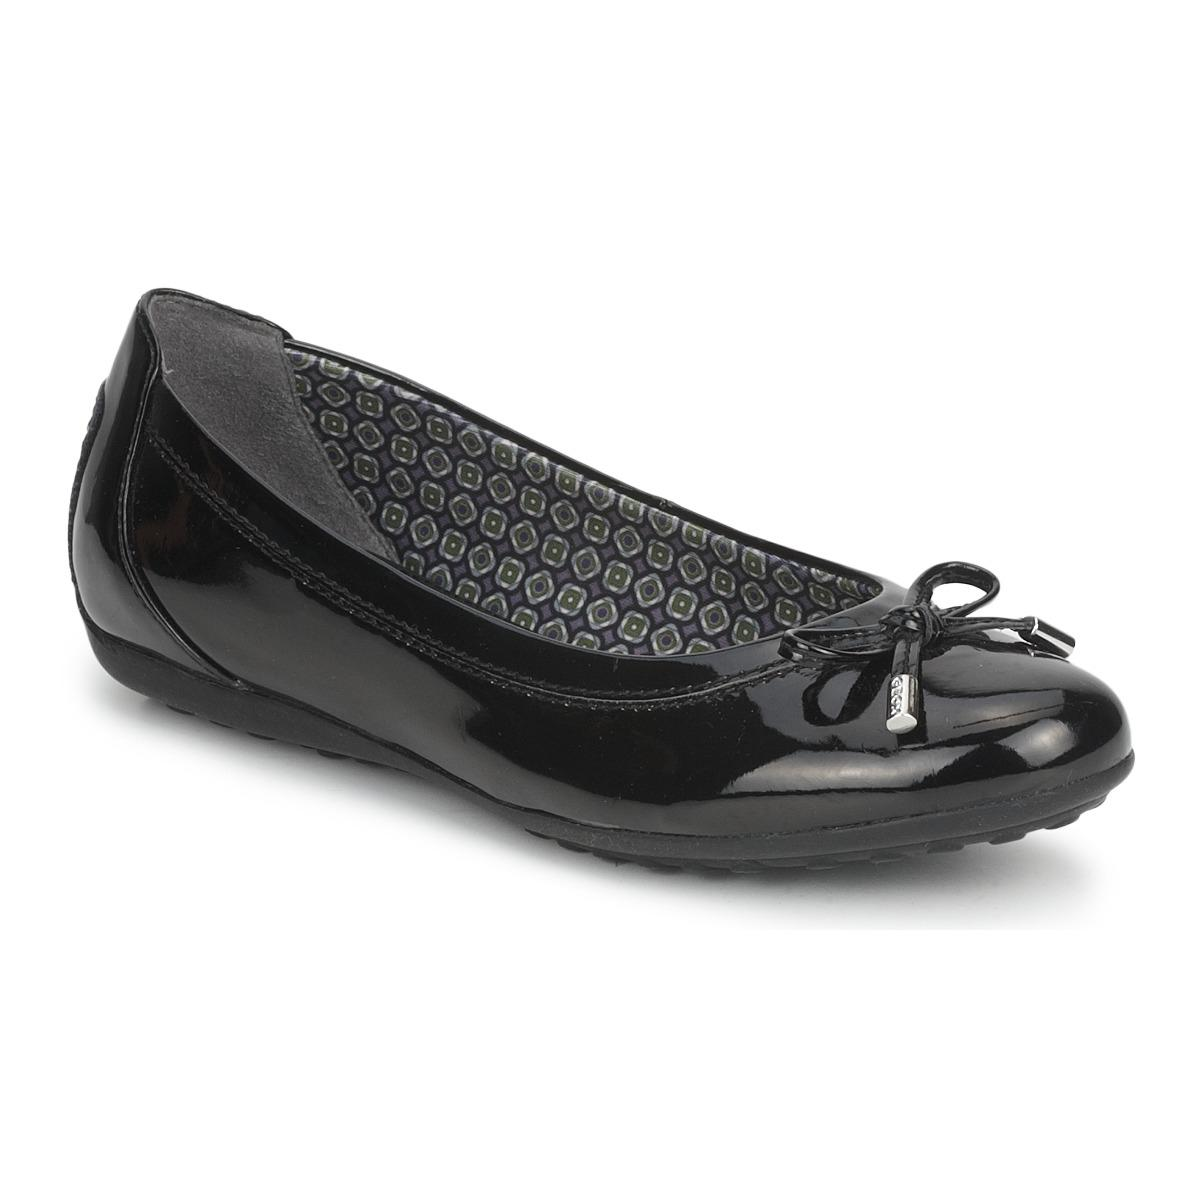 0aa163e61be Geox Piuma Ballerina Patent Shoes (pumps   Ballerinas) in Black - Lyst